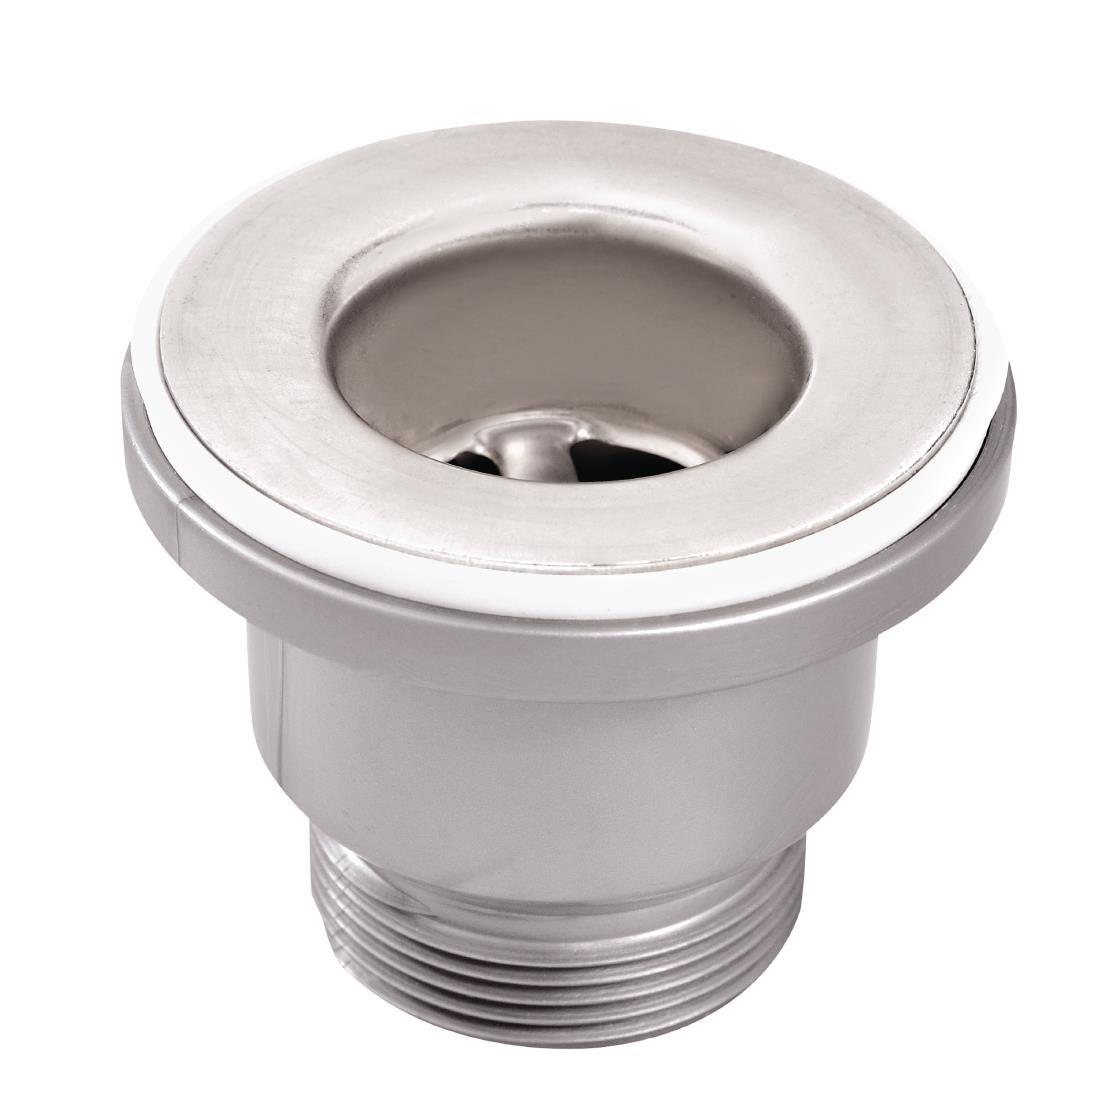 Buy Drain Plug